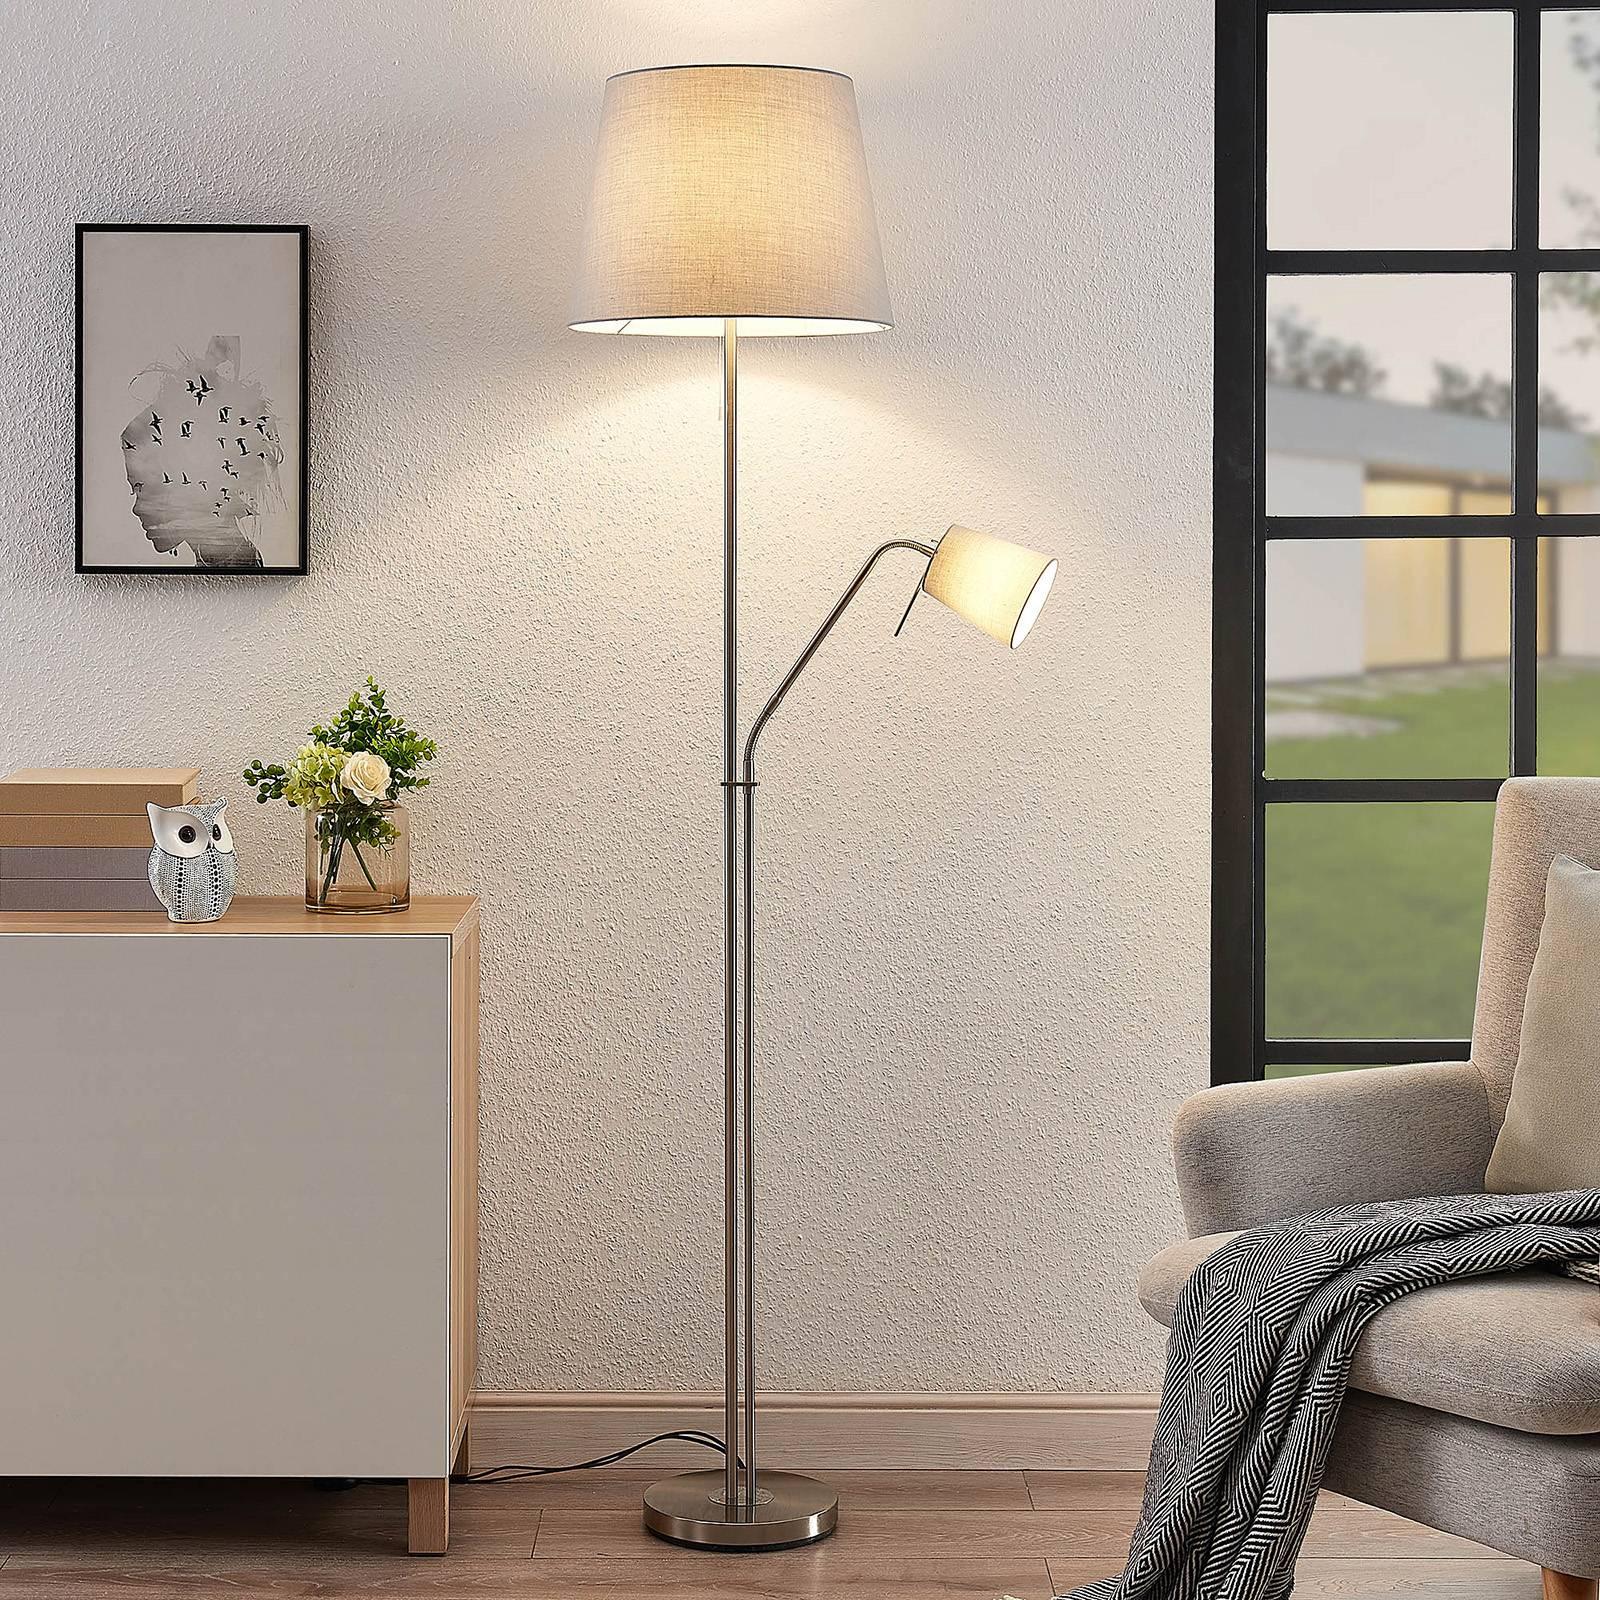 Lindby Nantwin vloerlamp, stoffen kap, grijs